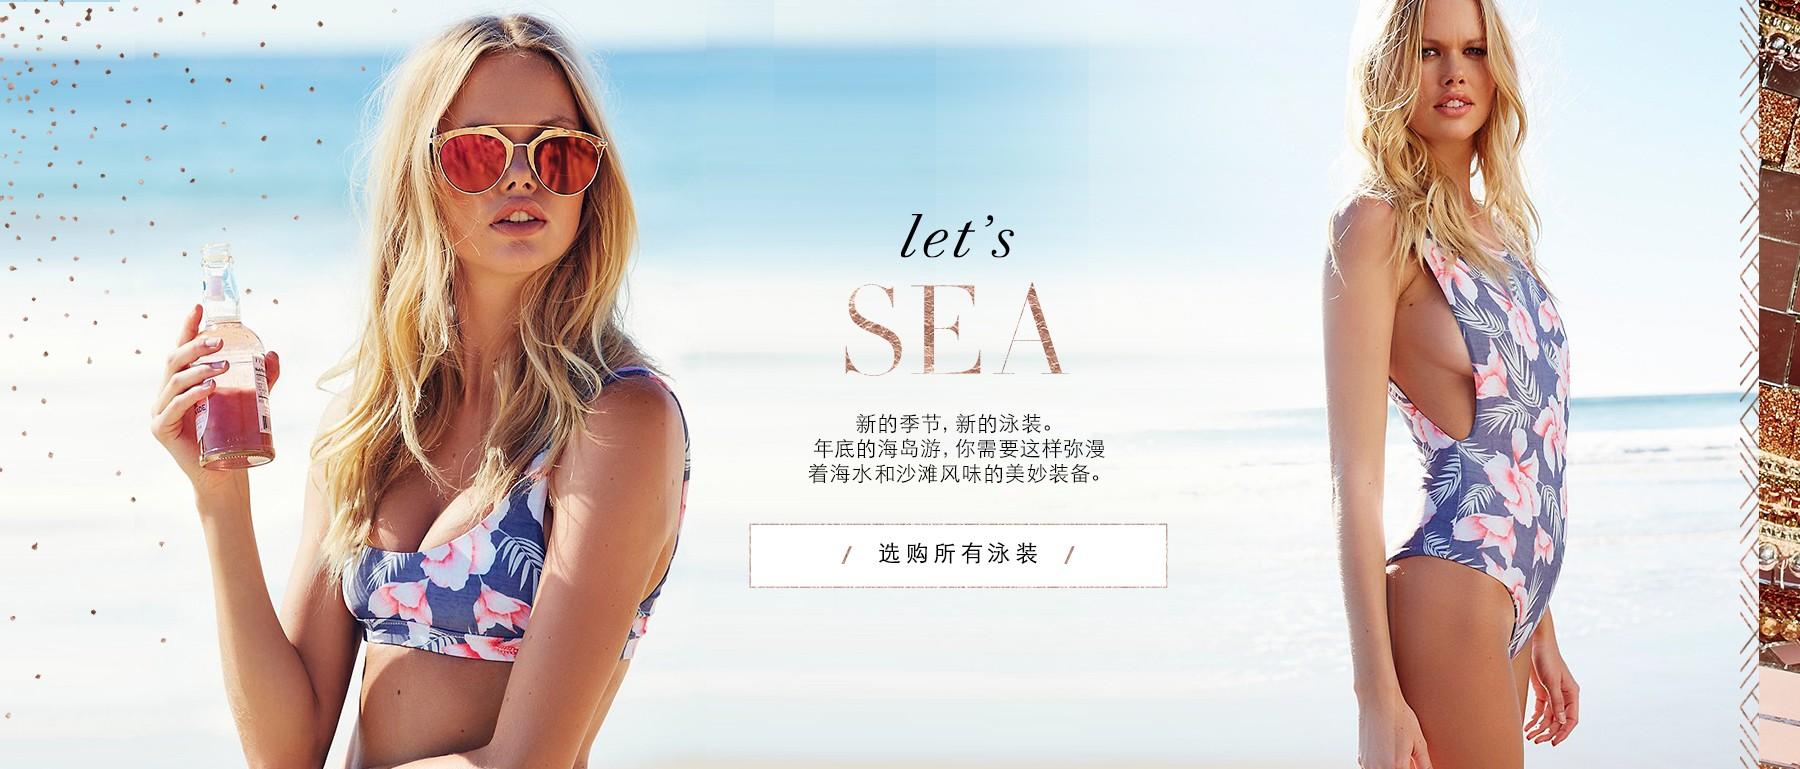 Shop All Swimwear at Free People